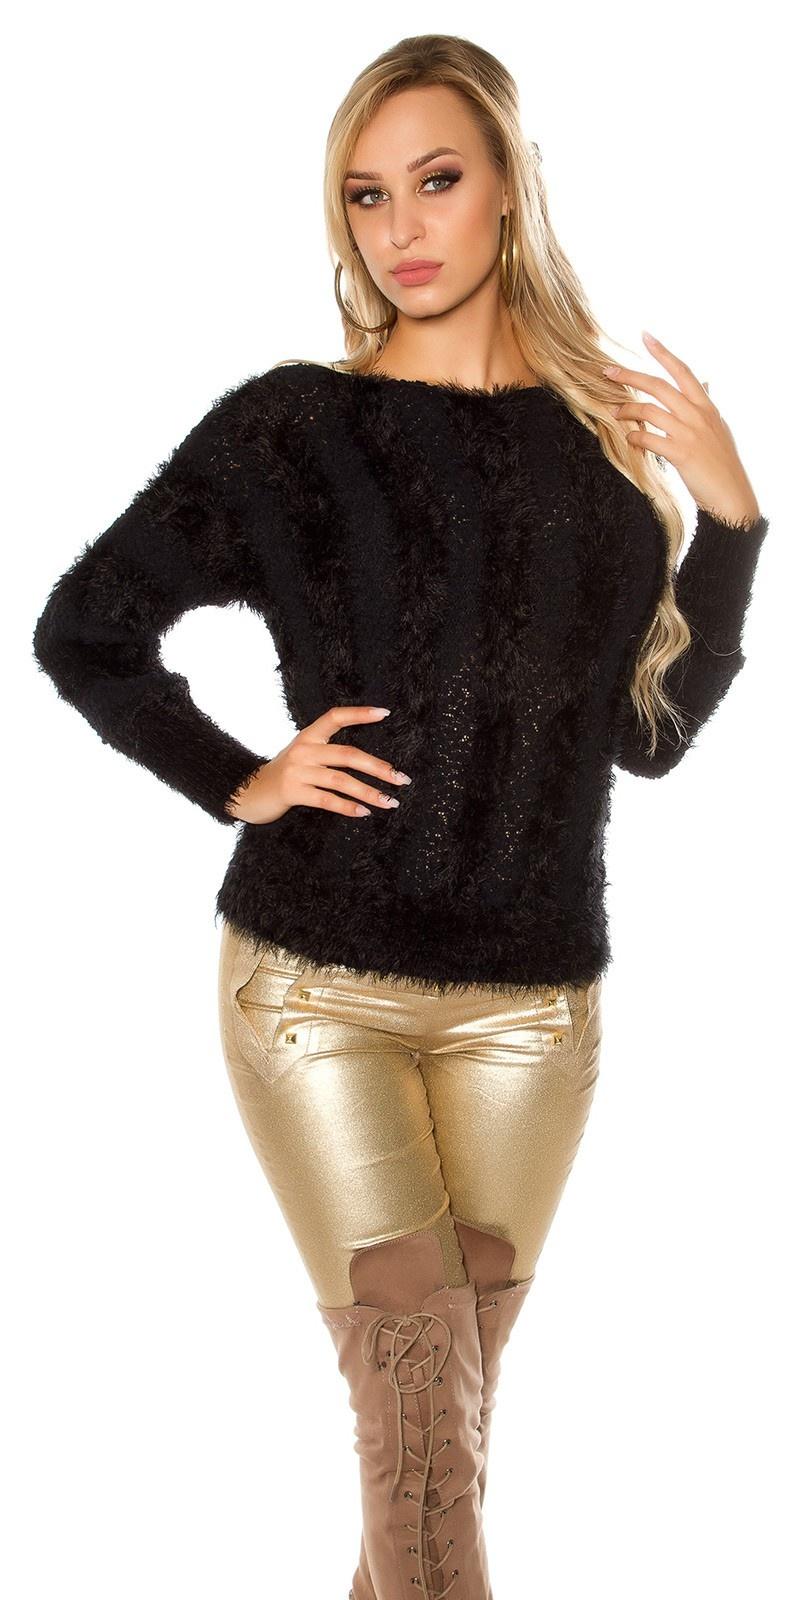 Sexy KouCla Plush Cuddly Fur jumper with Buclee Black